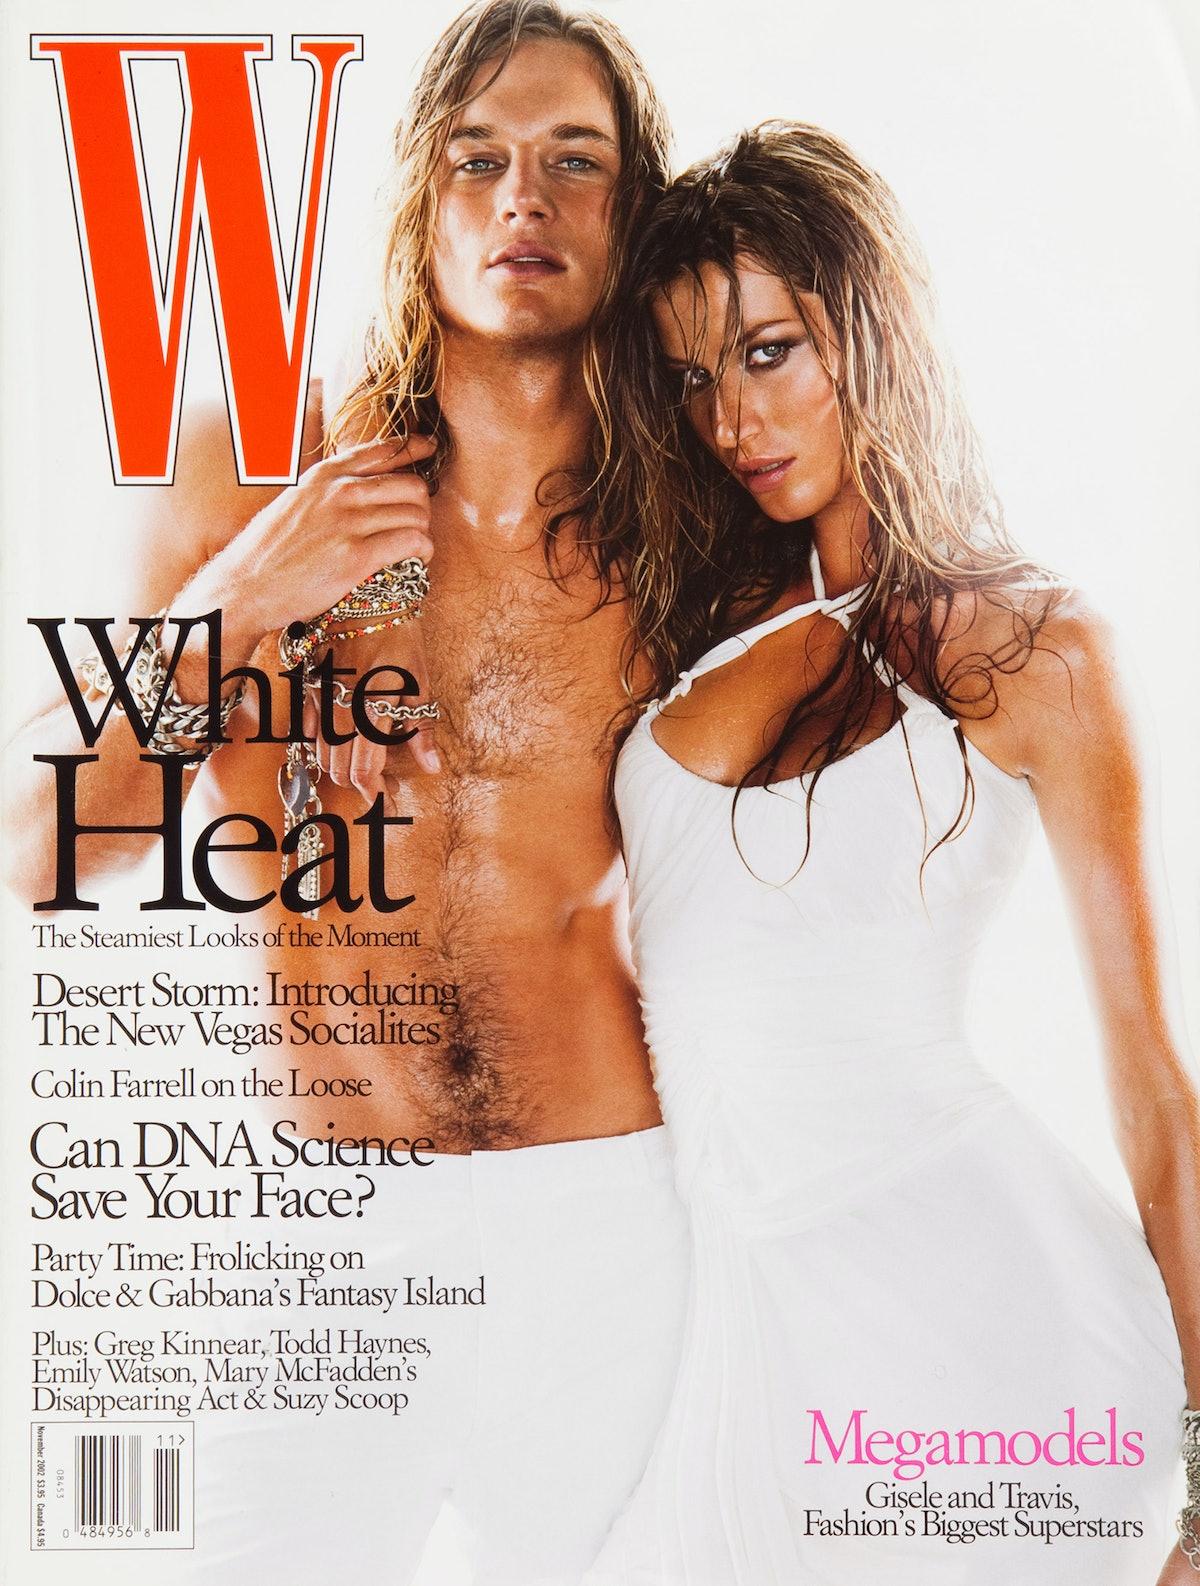 Travis Fimmel and Gisele Bundchen on the cover of W Magazine November 2002